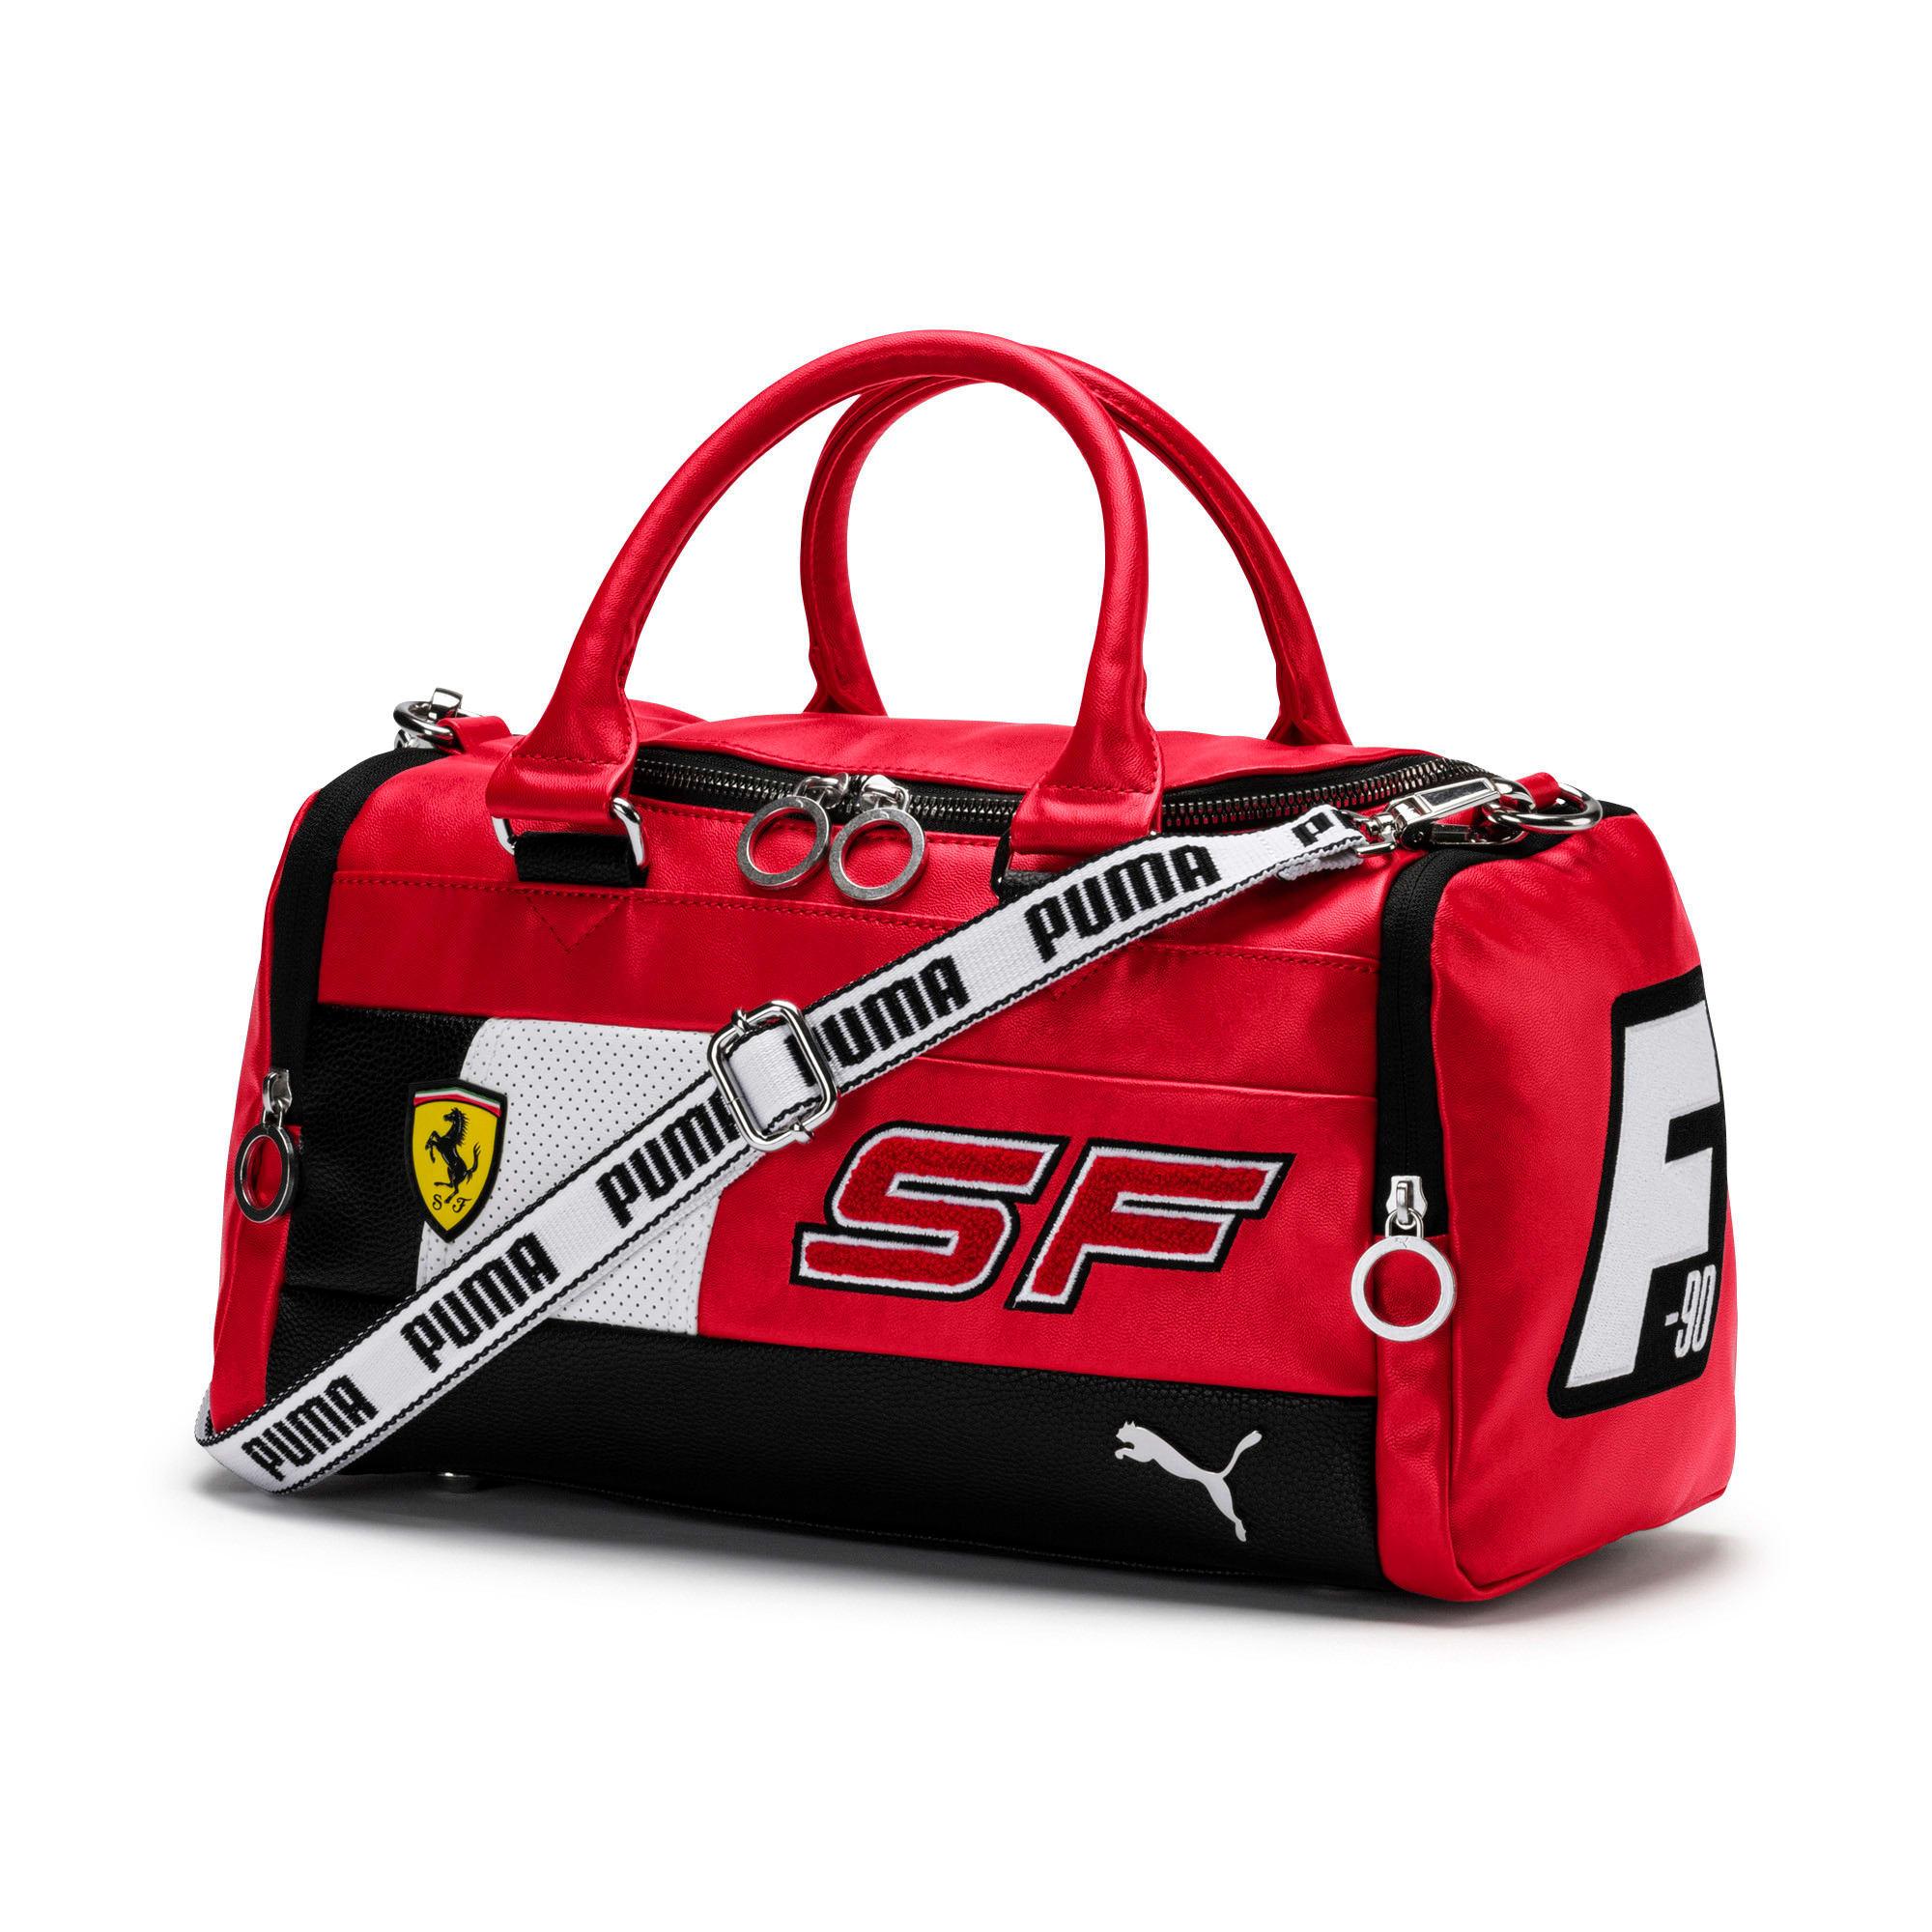 Thumbnail 1 of Sac à main Ferrari SpeedCat pour femme, Rosso Corsa, medium